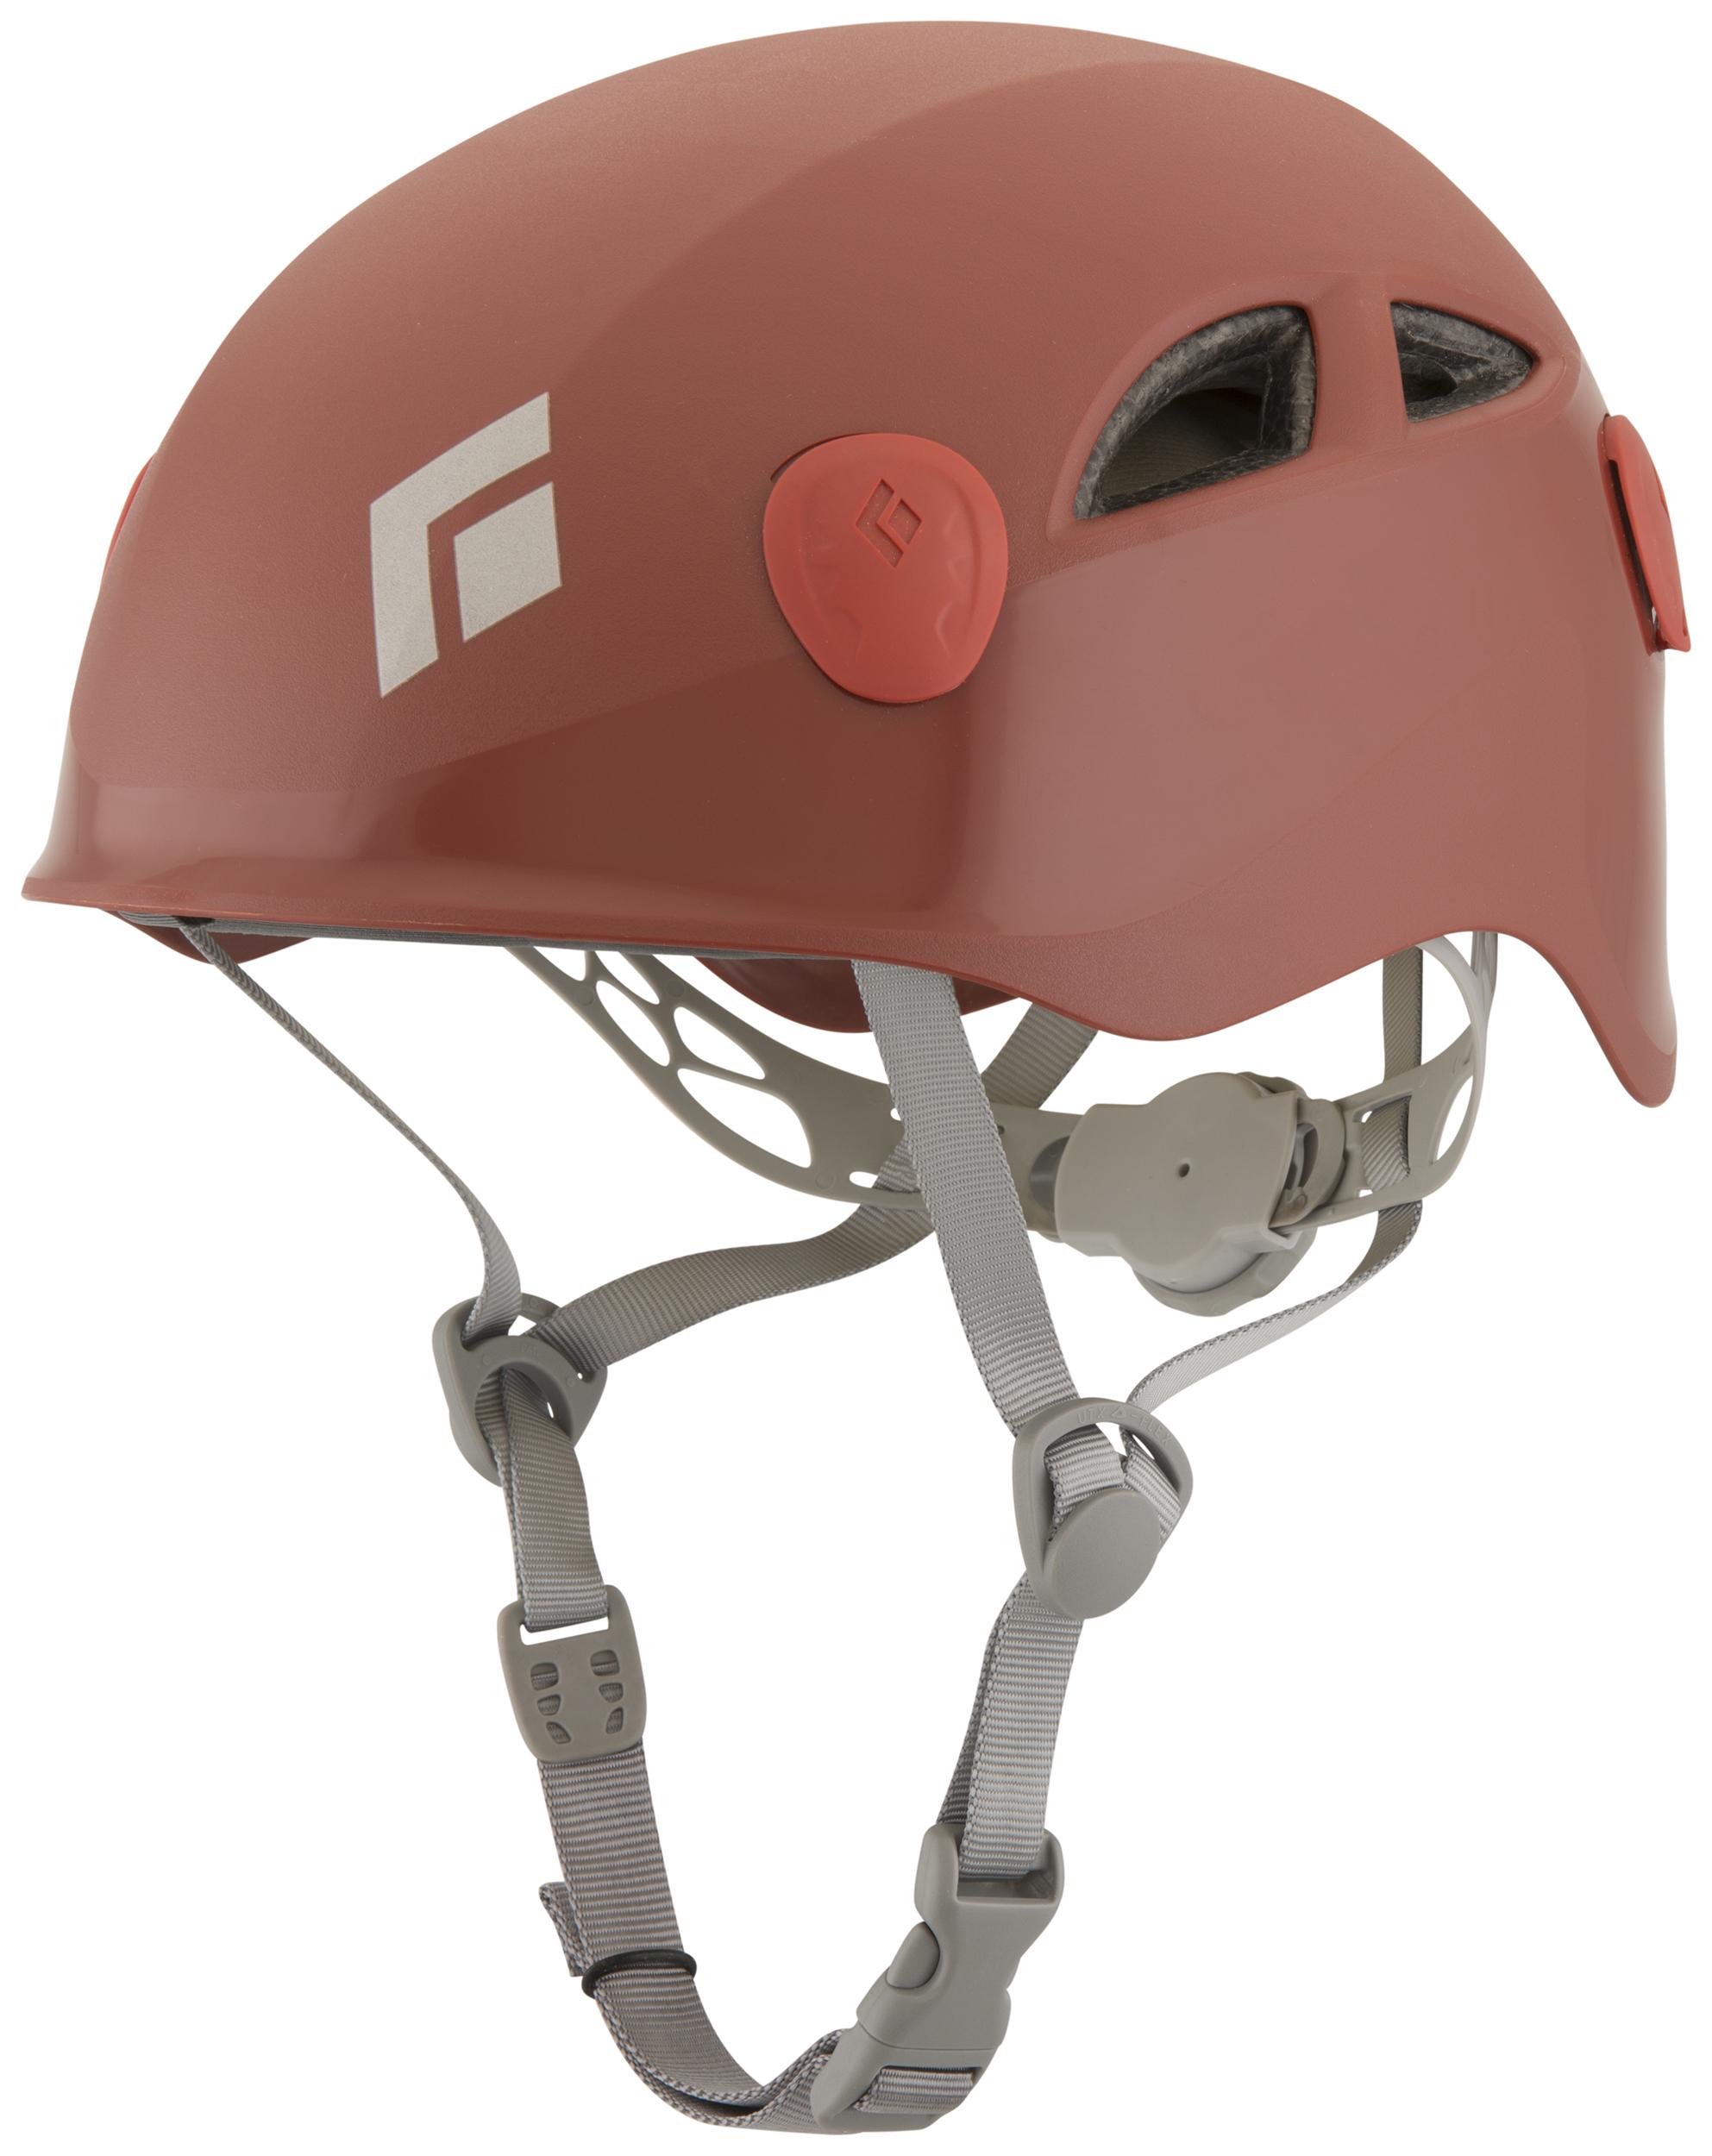 56c472c4efd Climbing helmets